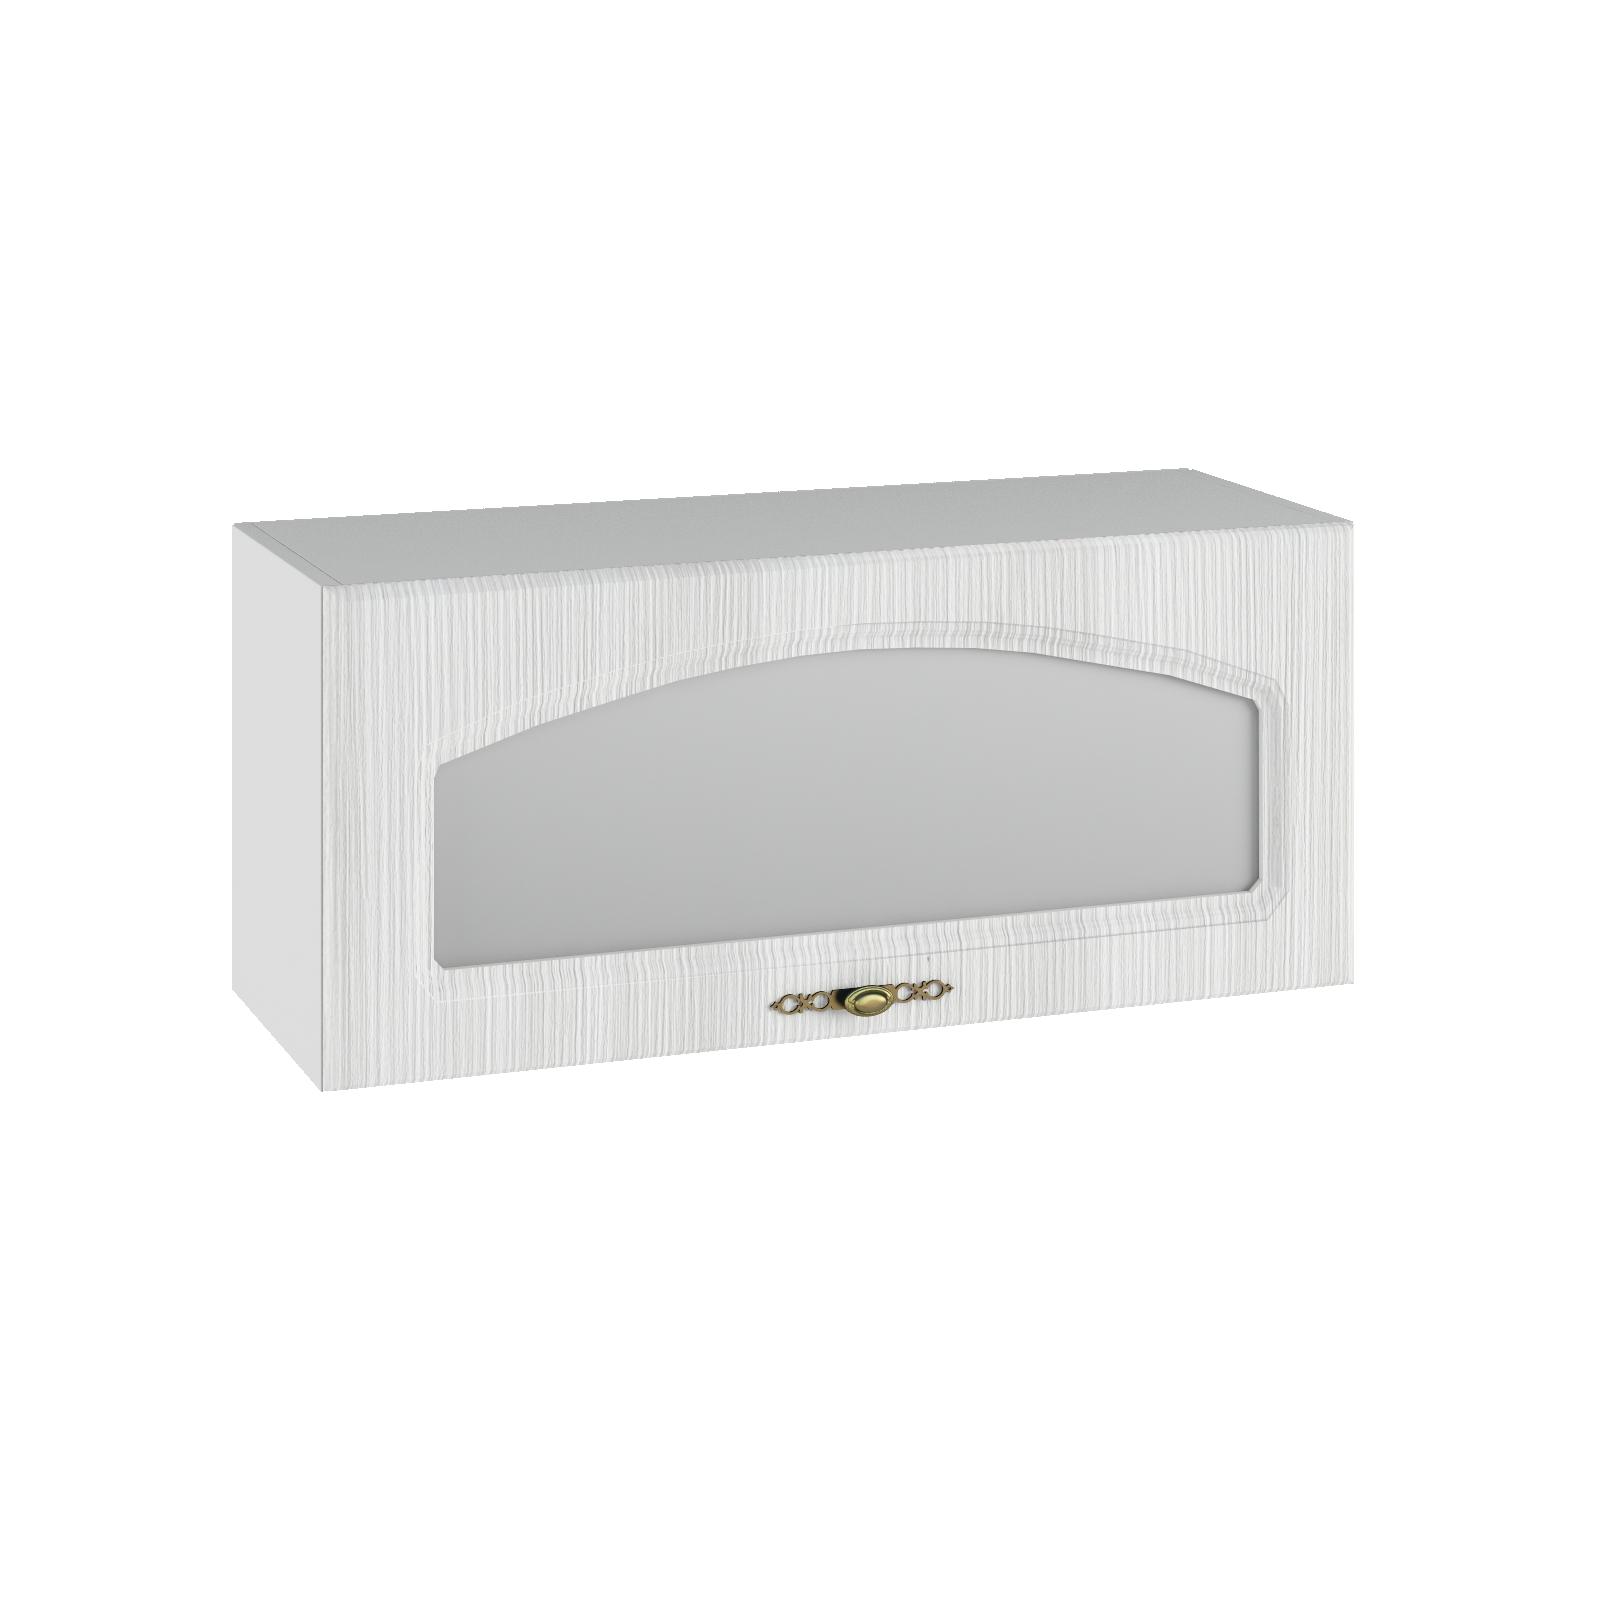 Кухня Монако ГПГС 800 Шкаф верхний глубина 574